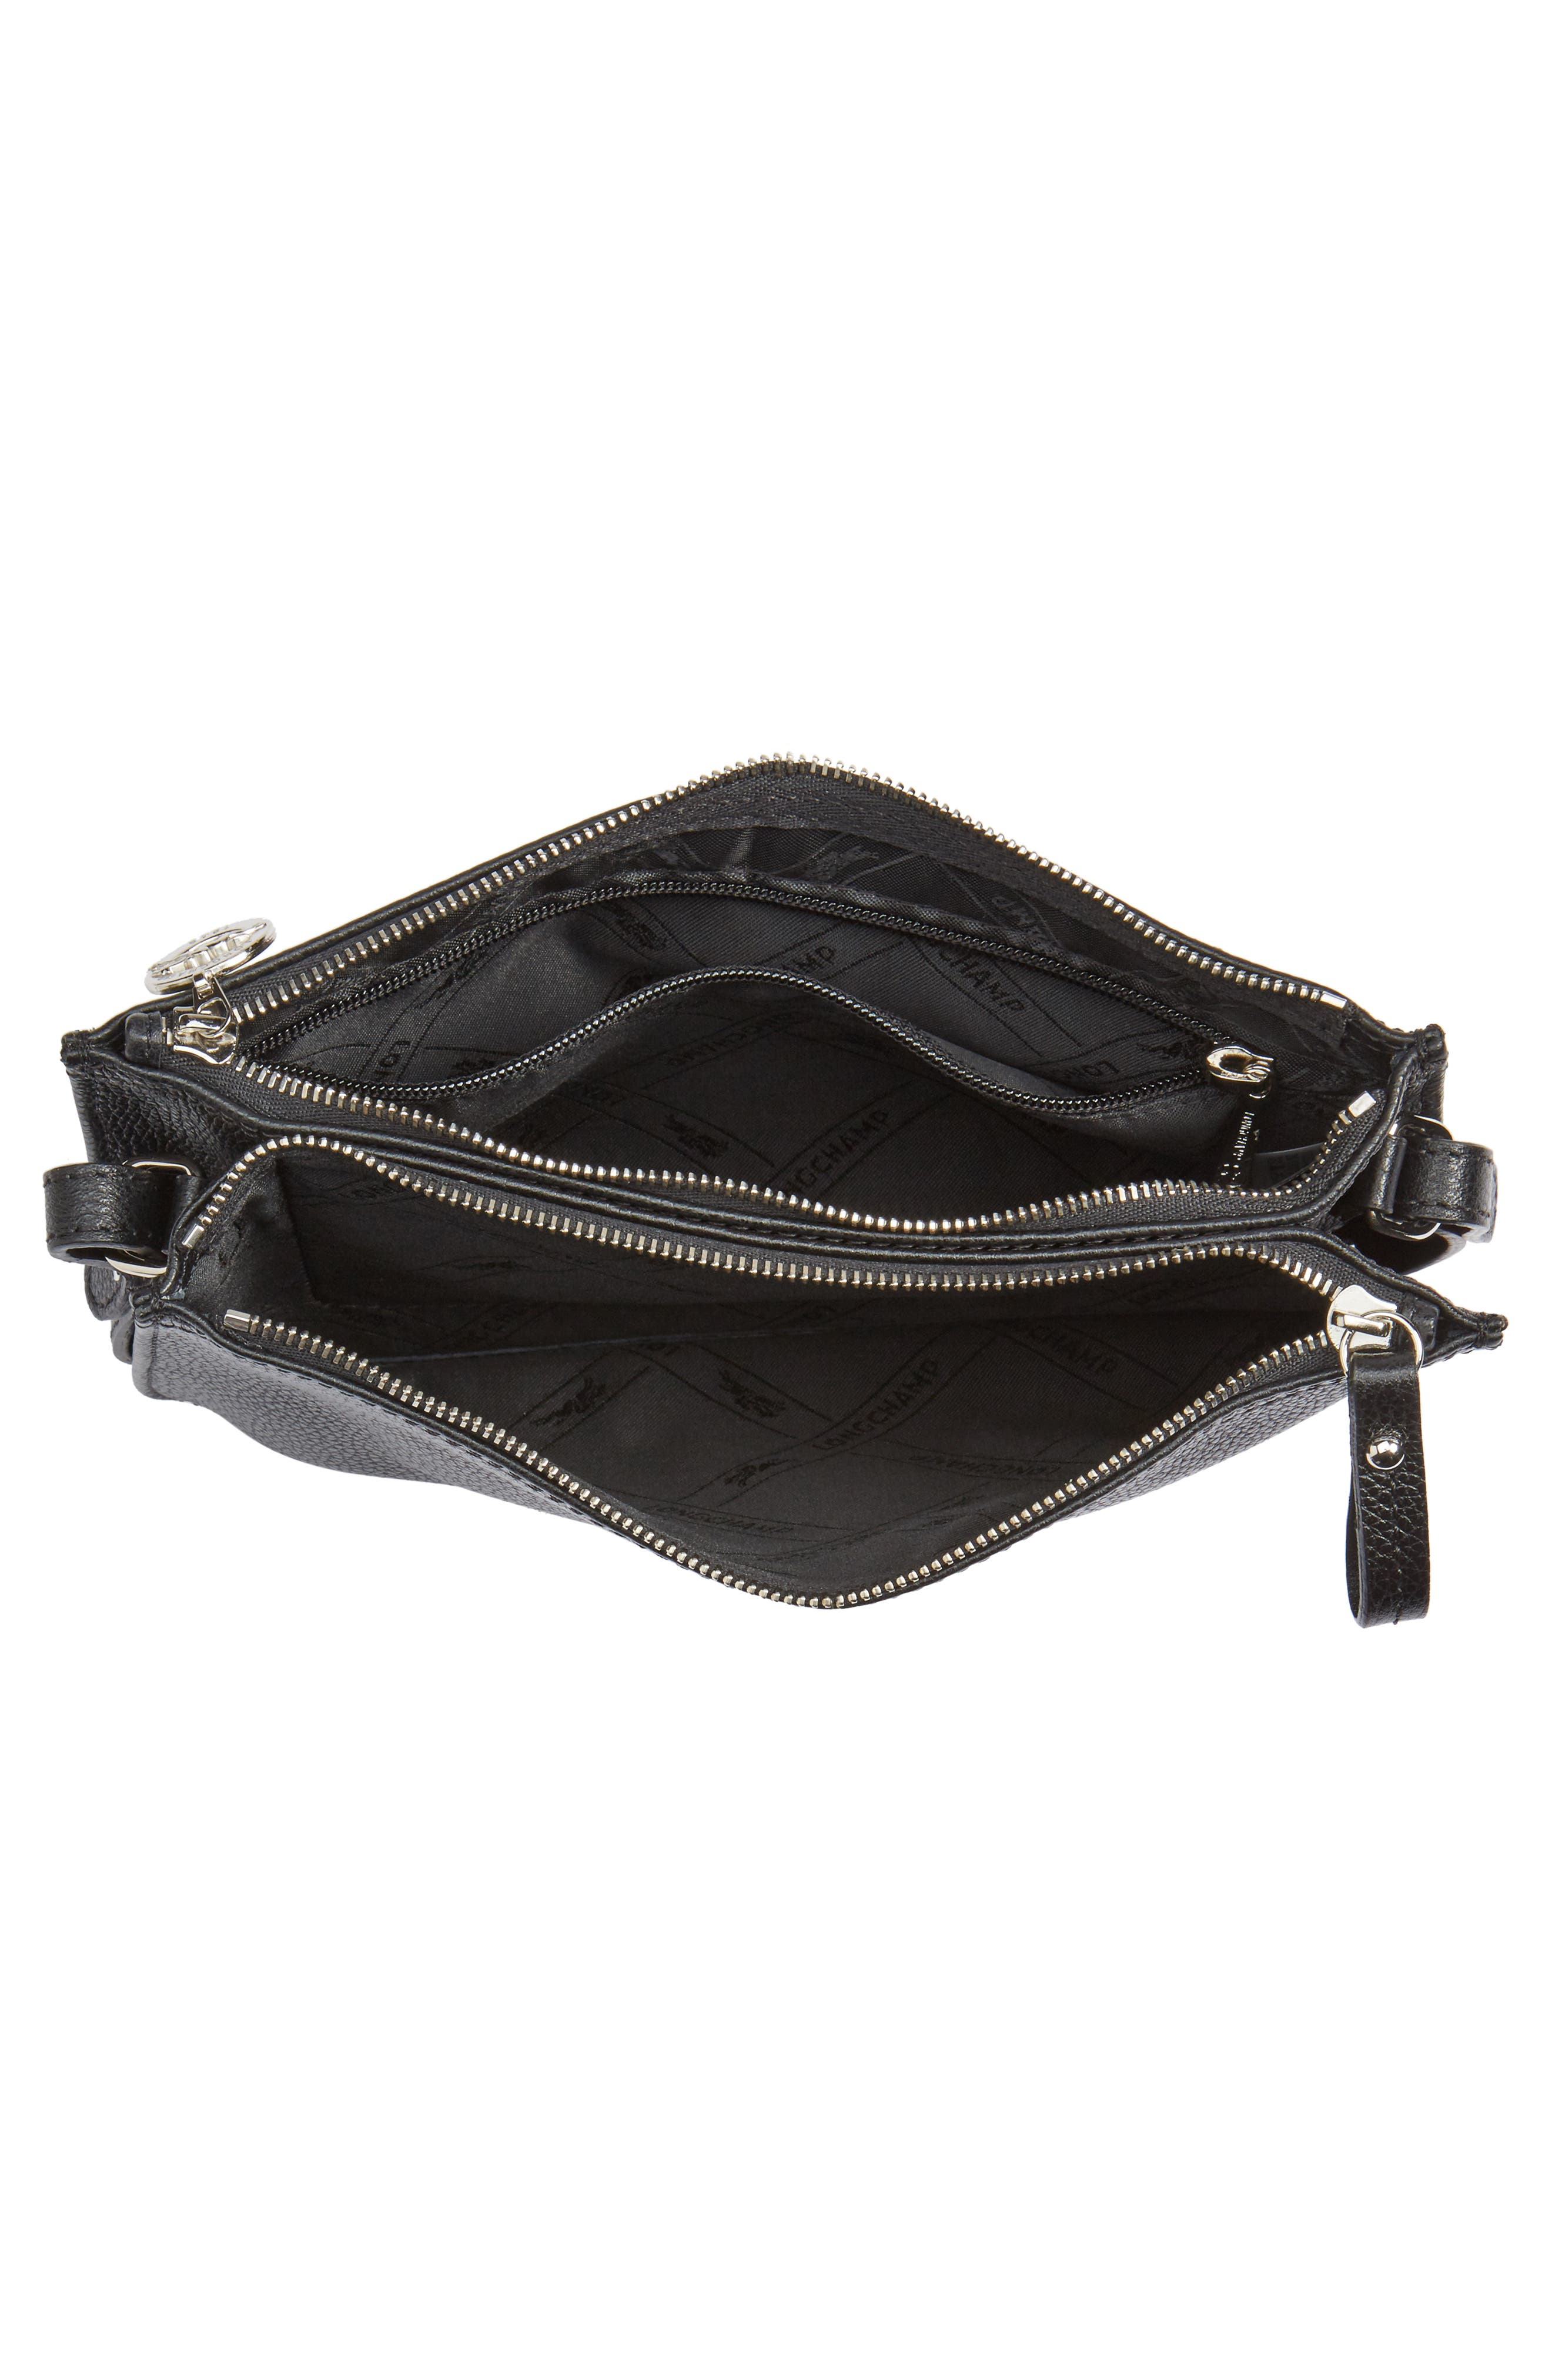 Le Foulonne Leather Crossbody Bag,                             Alternate thumbnail 4, color,                             002